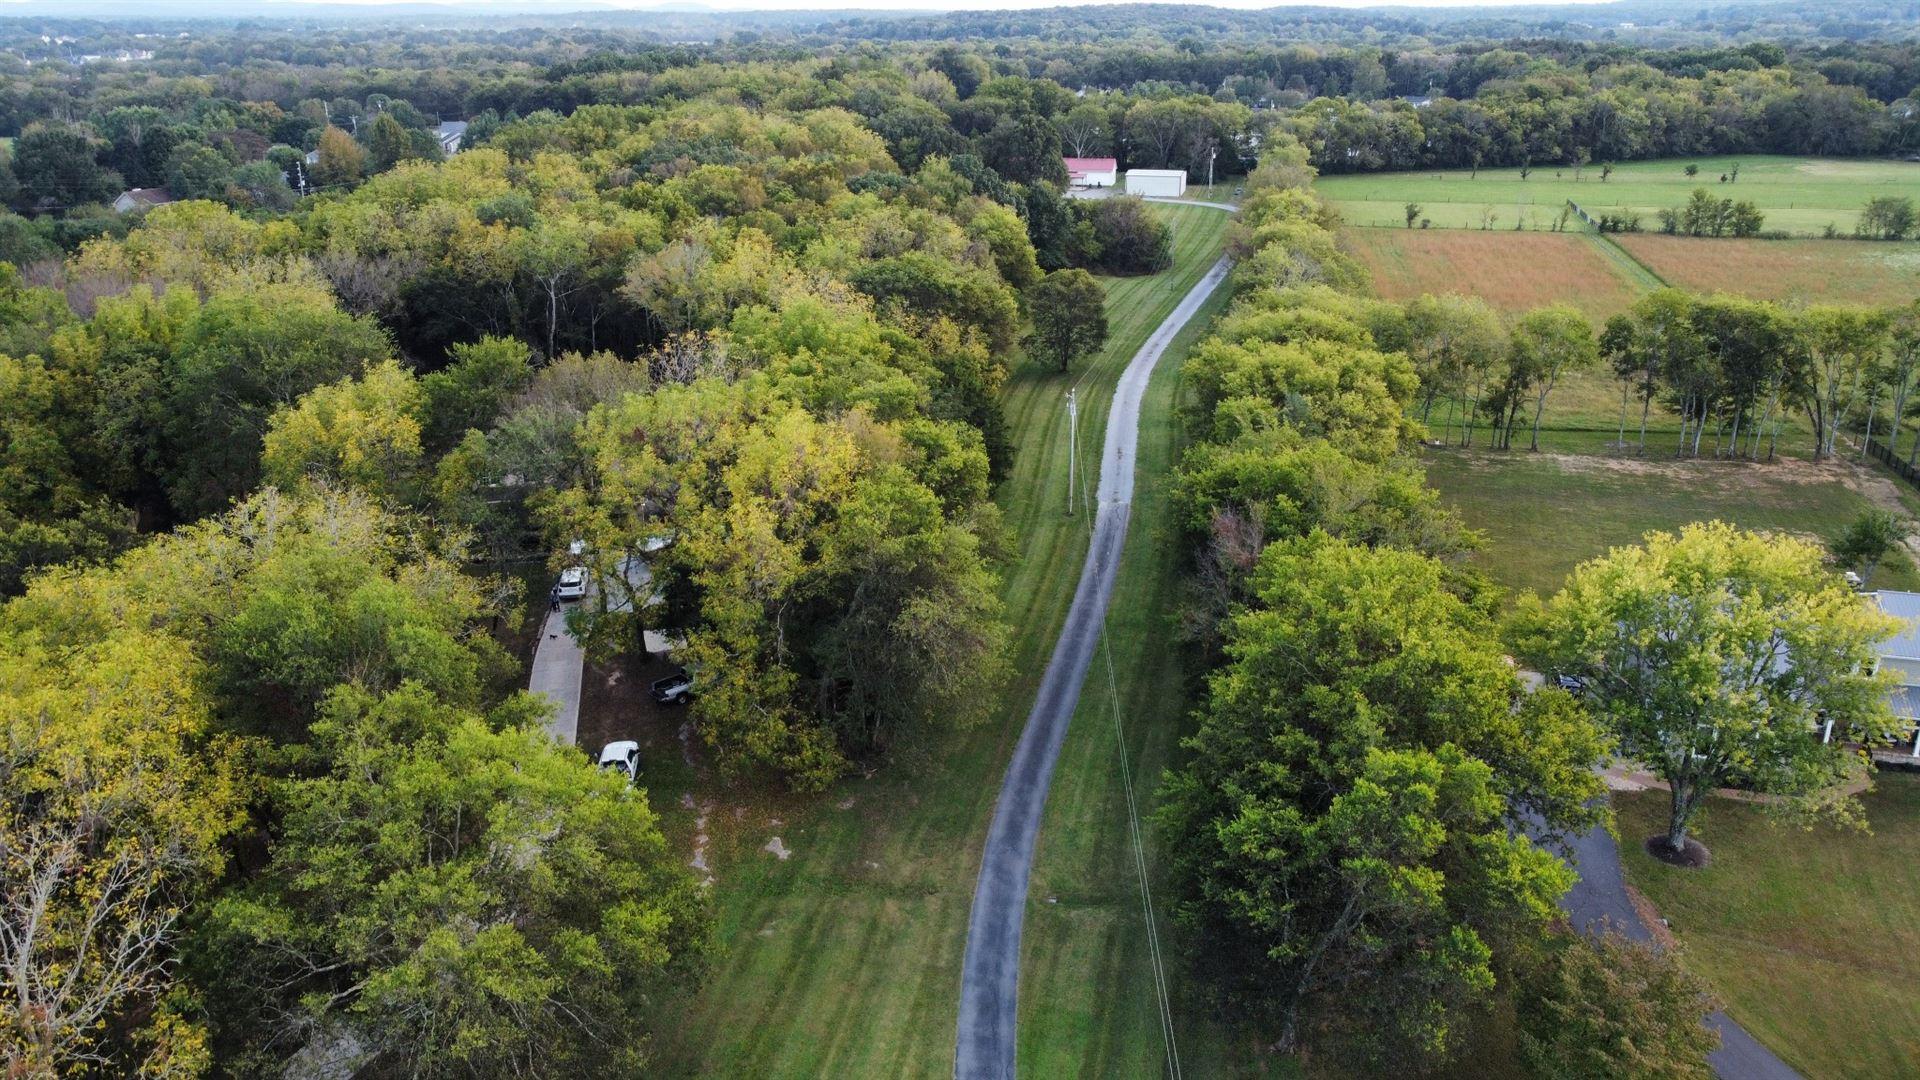 2101 Thompson Rd E, Murfreesboro, TN 37128 - MLS#: 2300431